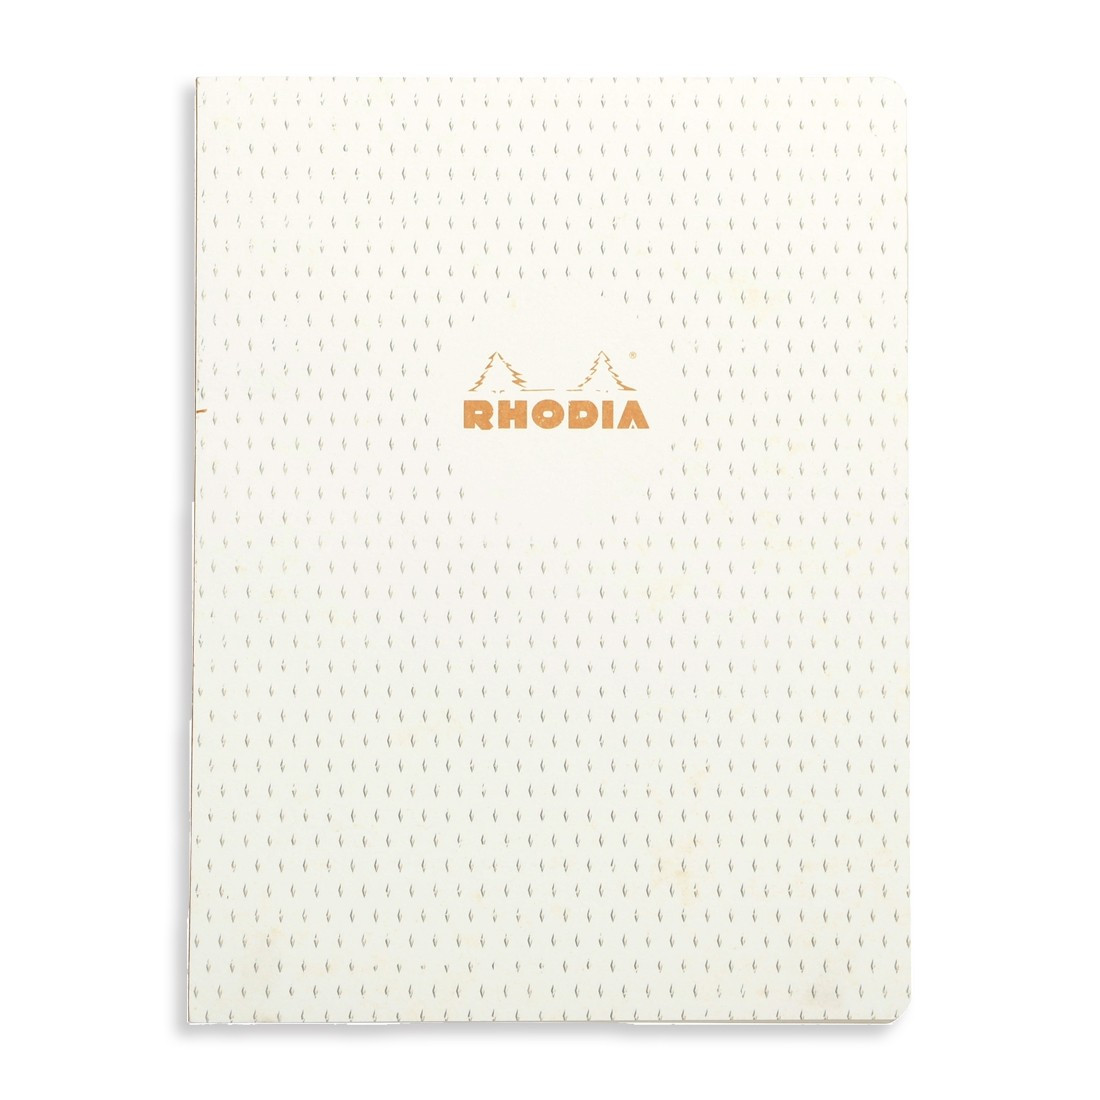 Rhodia Heritage Notebook - Ivory Moucheture